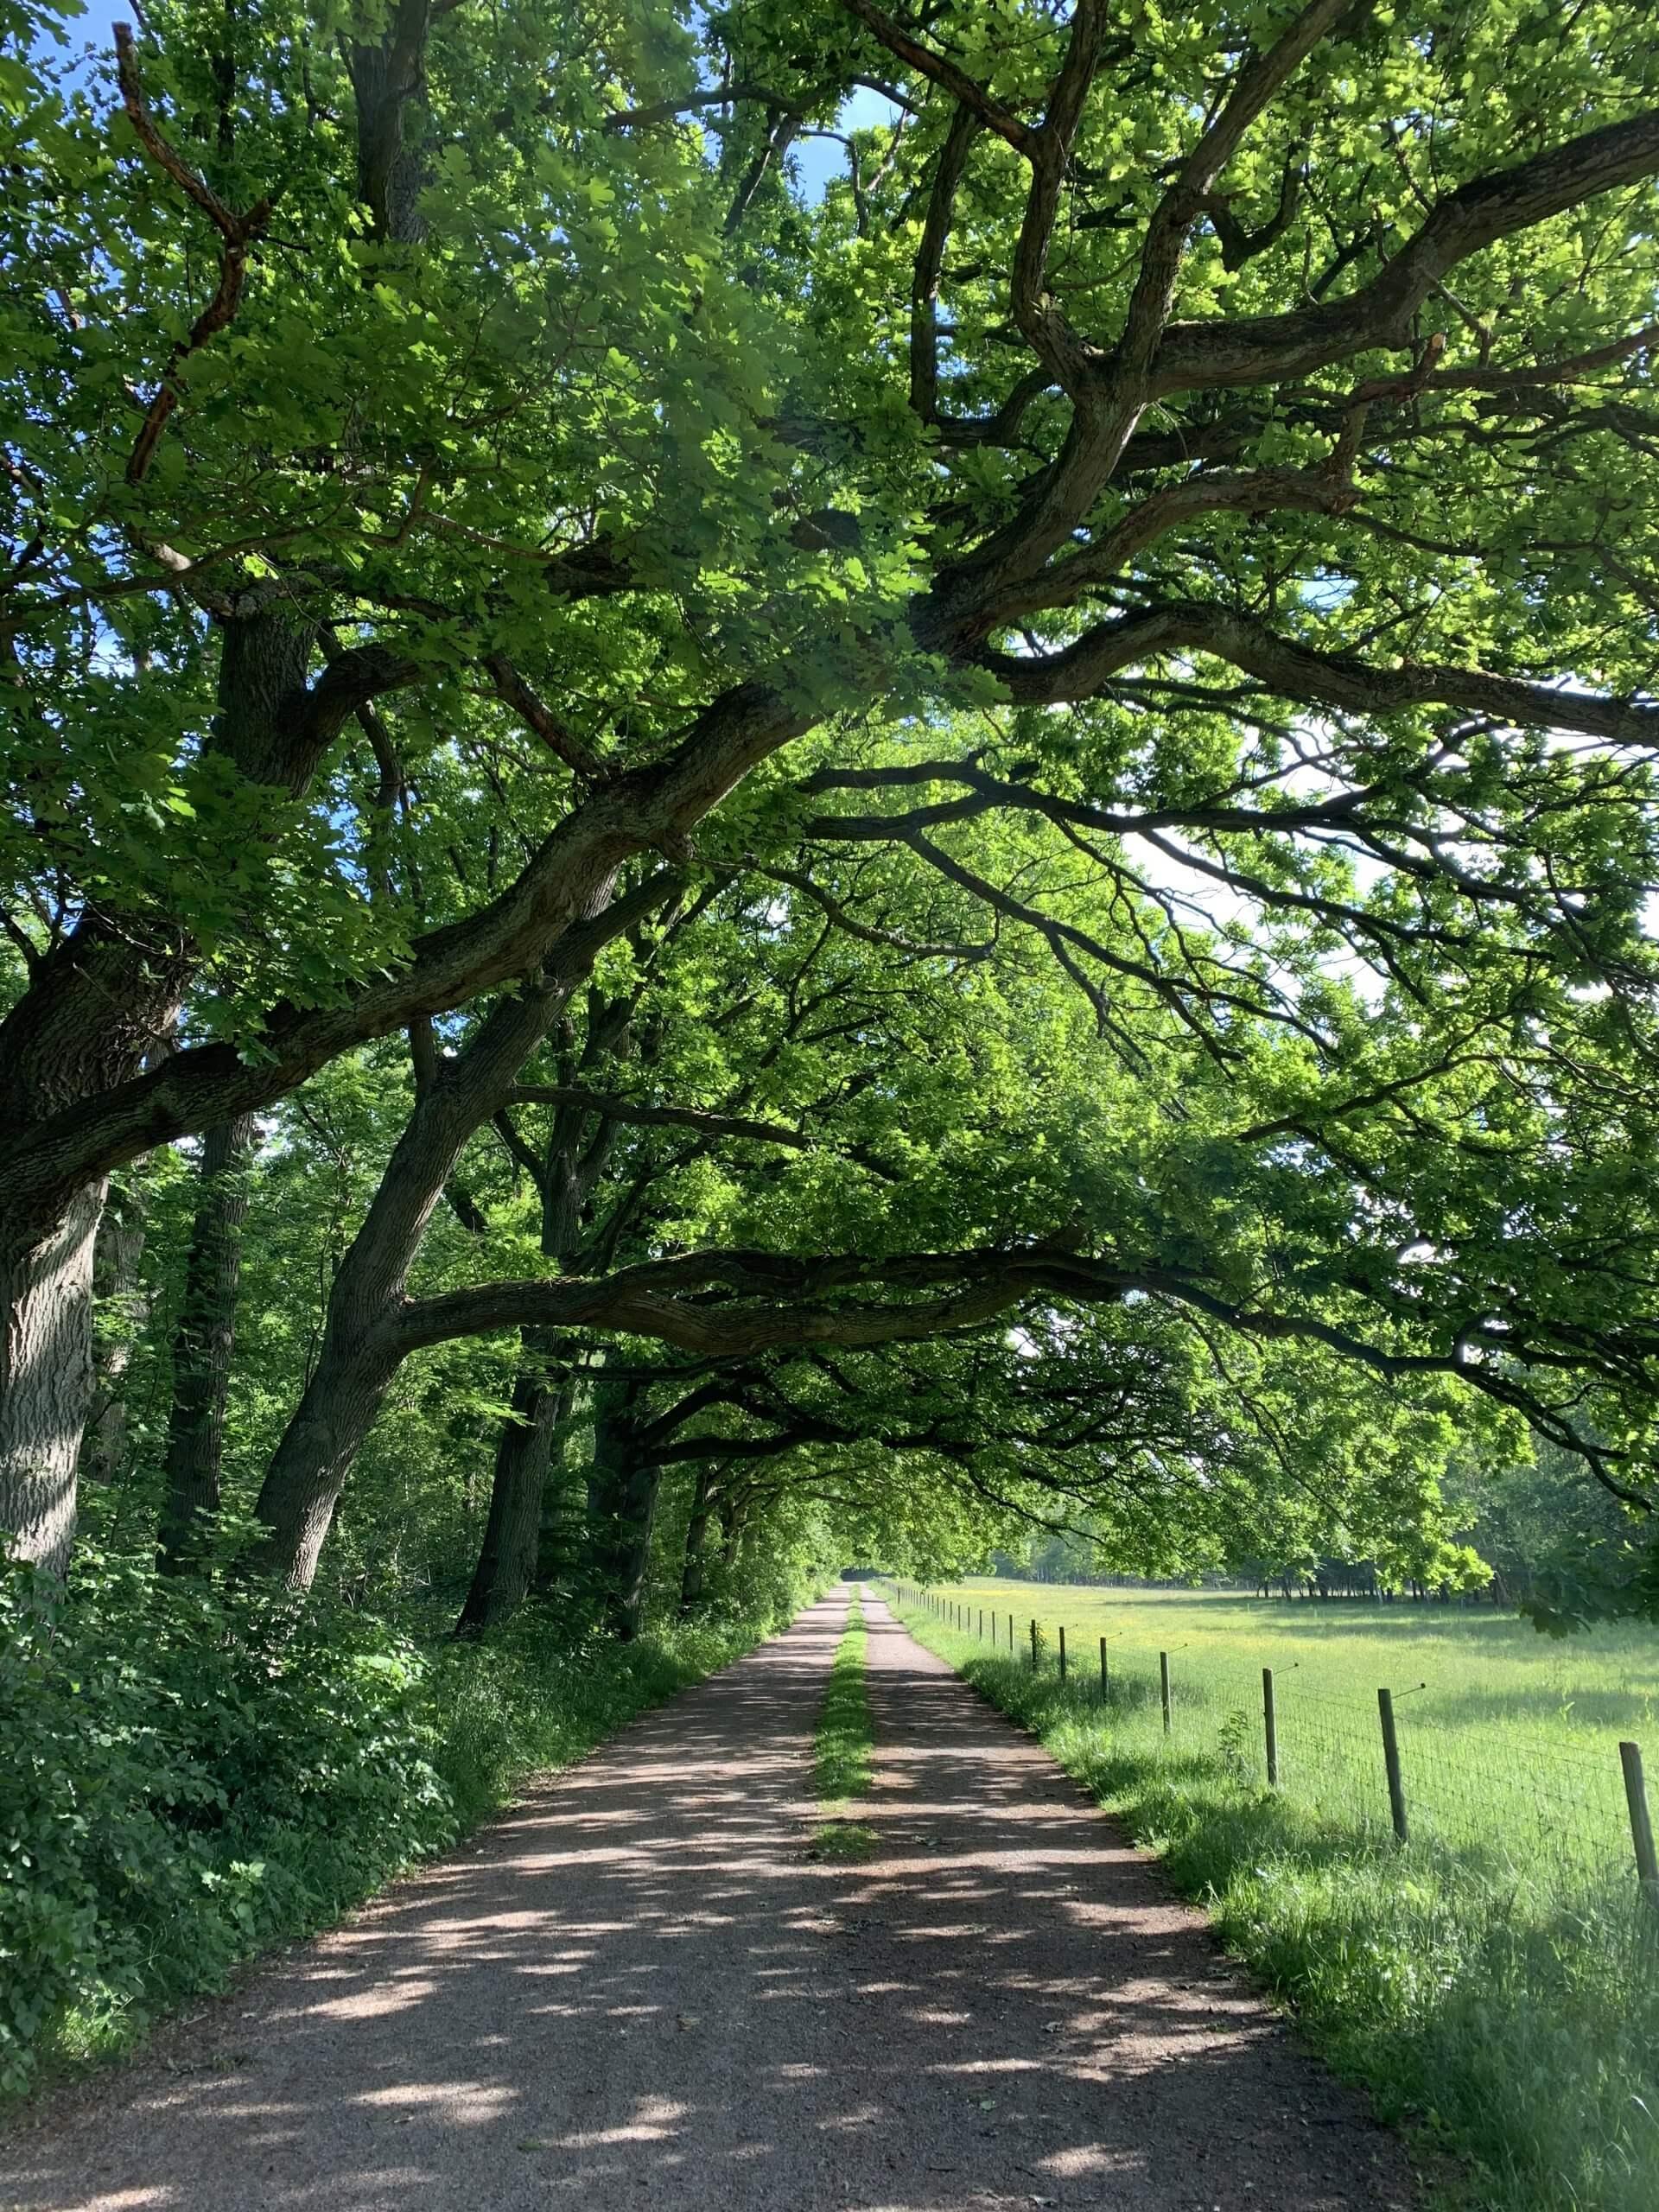 Quercus in a park